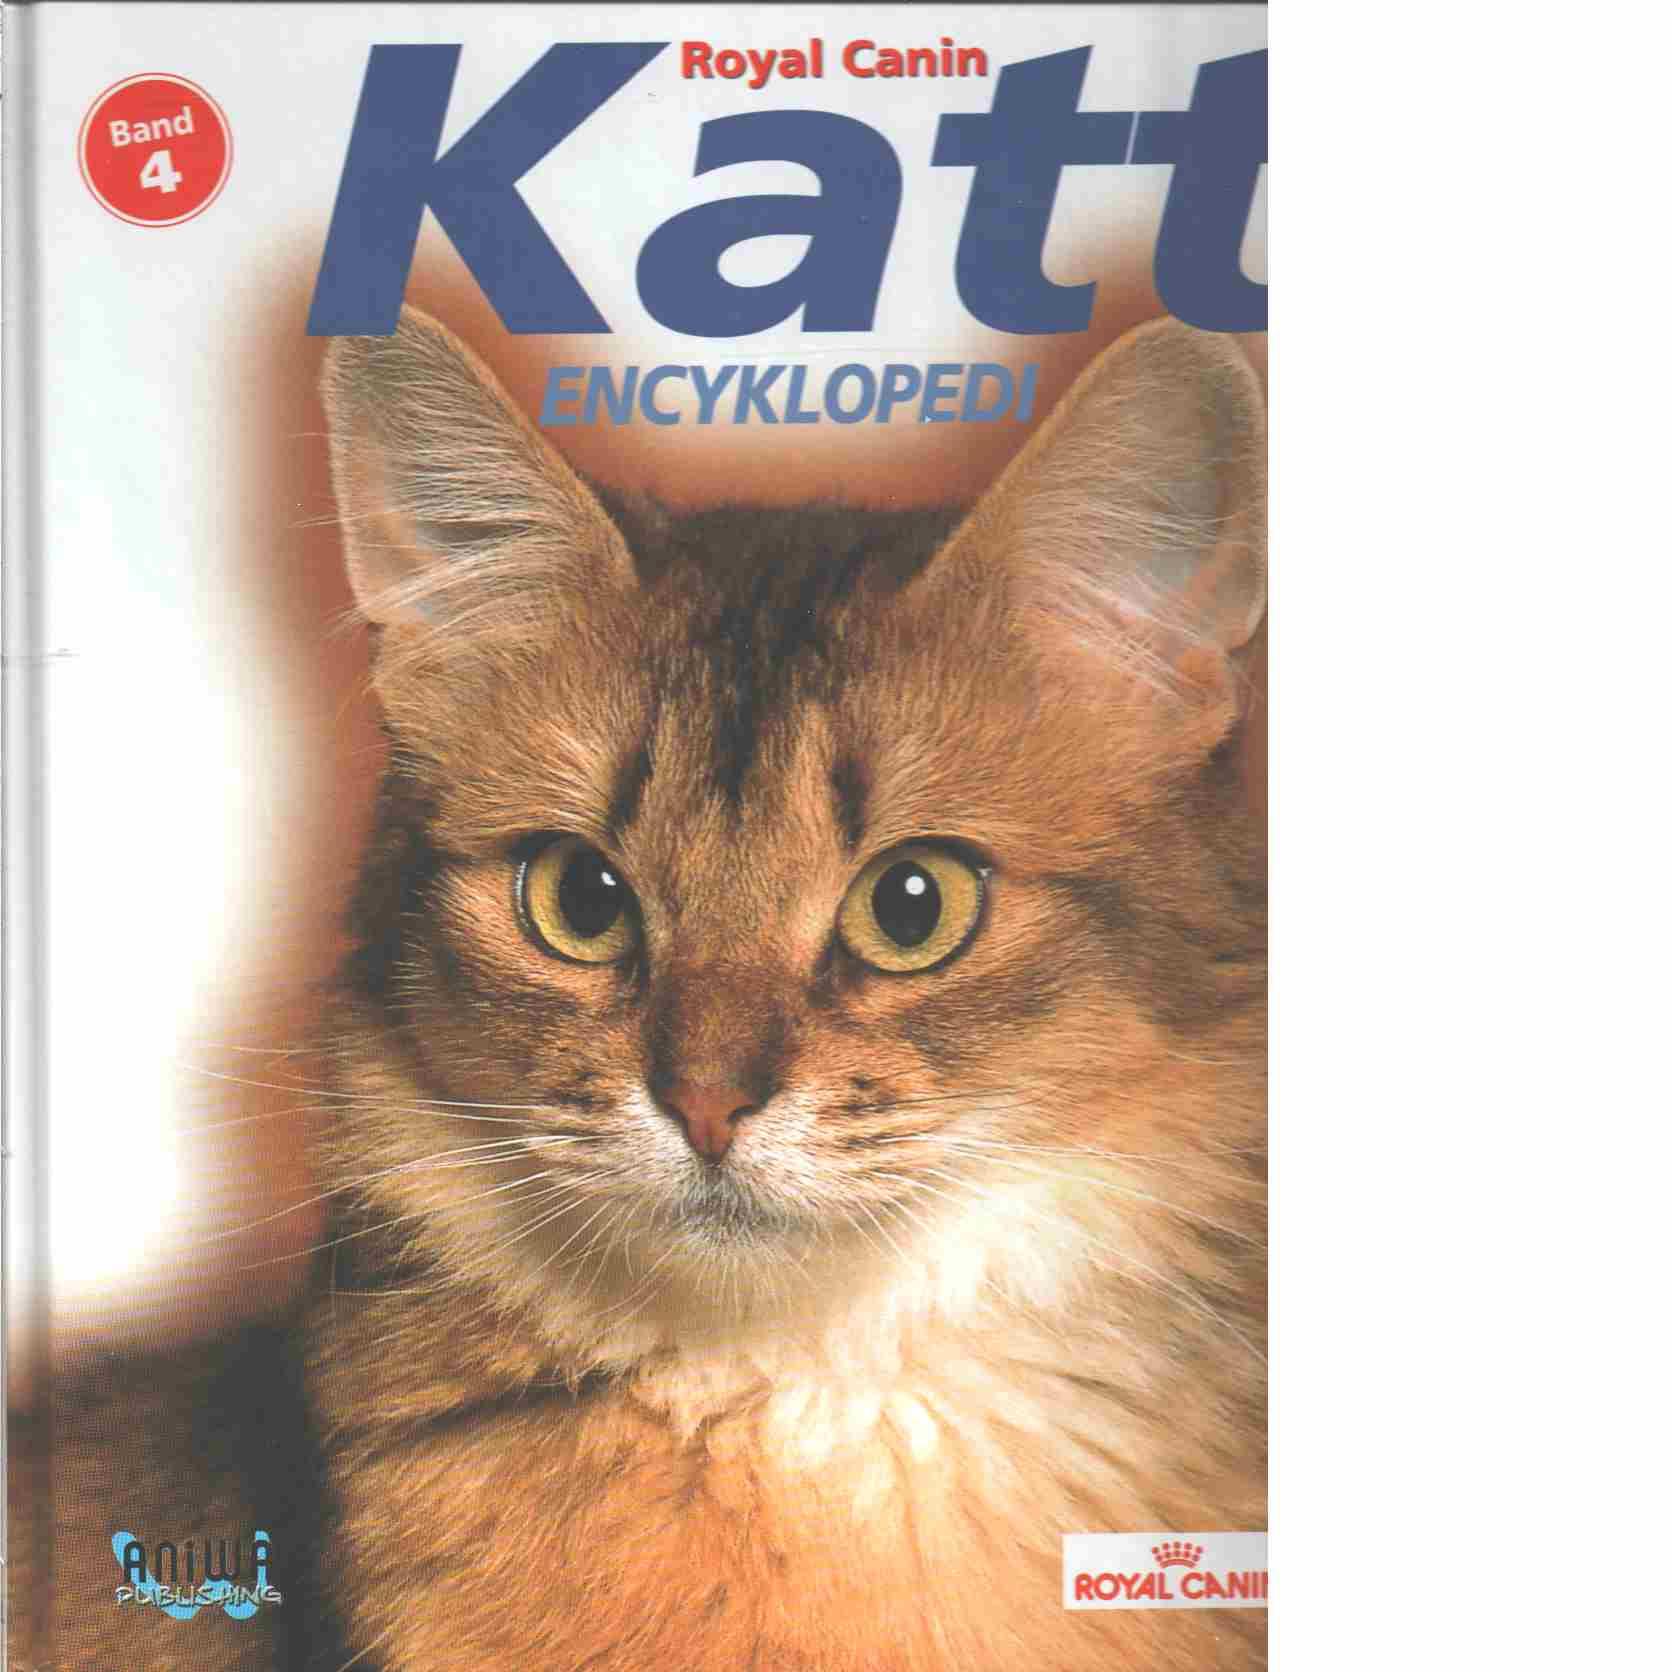 Katt encyklopedi : Bok 4 - Red. Royal Canin